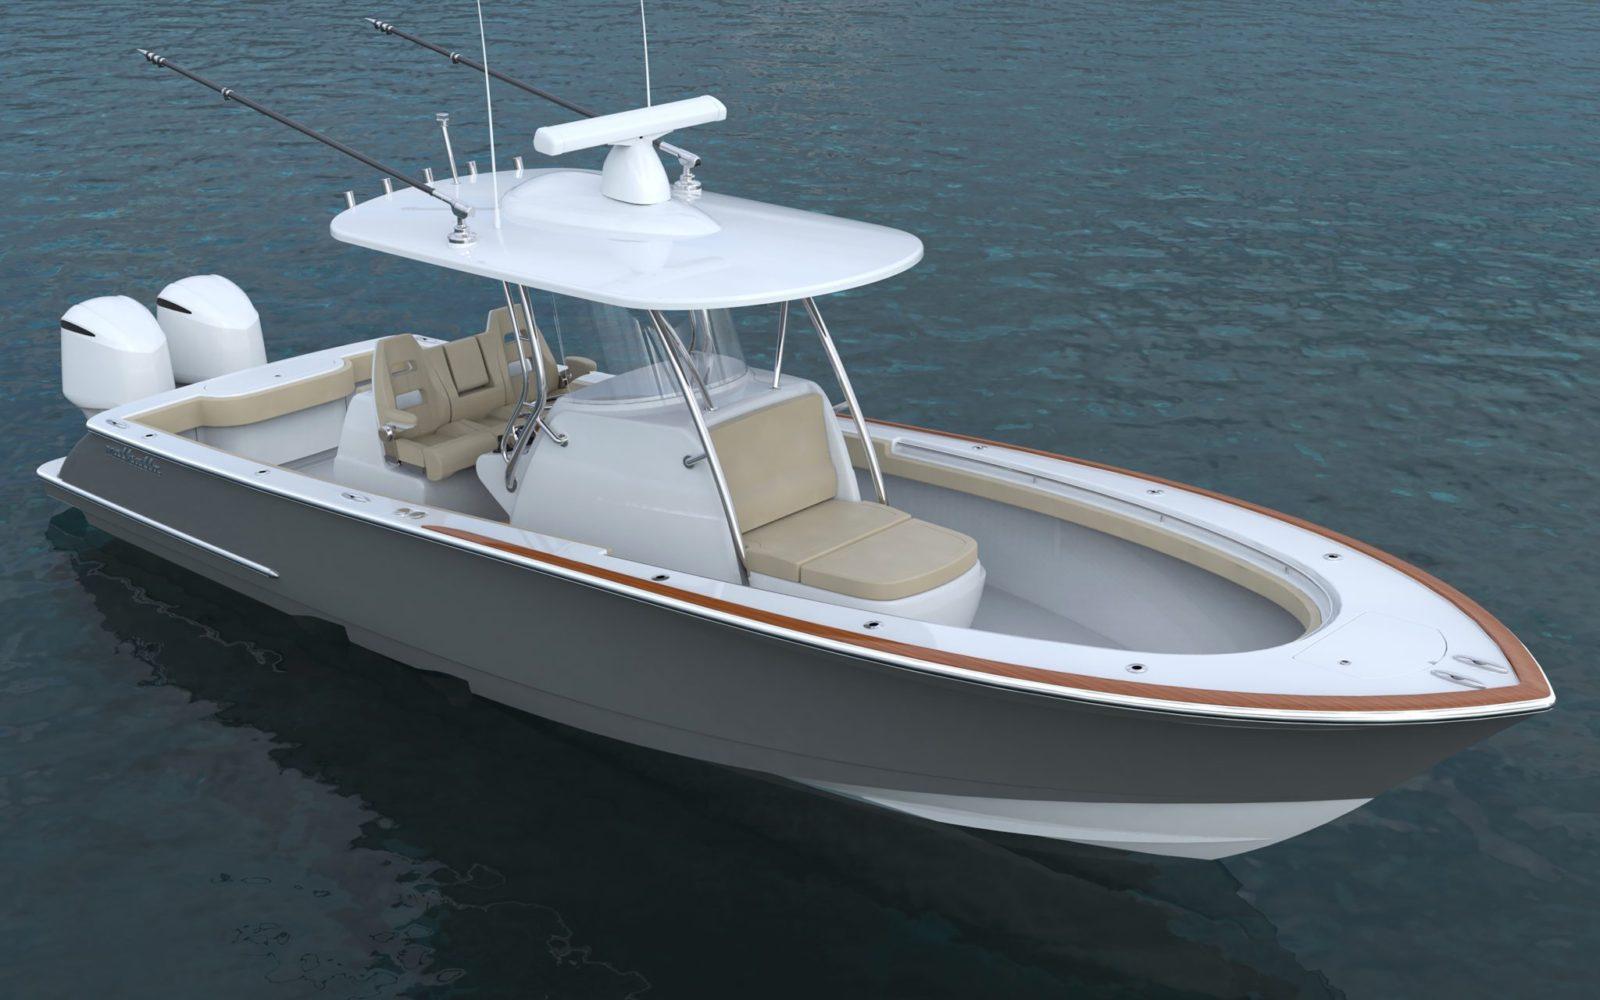 V33_Bow Quarter_Water | VALHALLA V-33 (New)